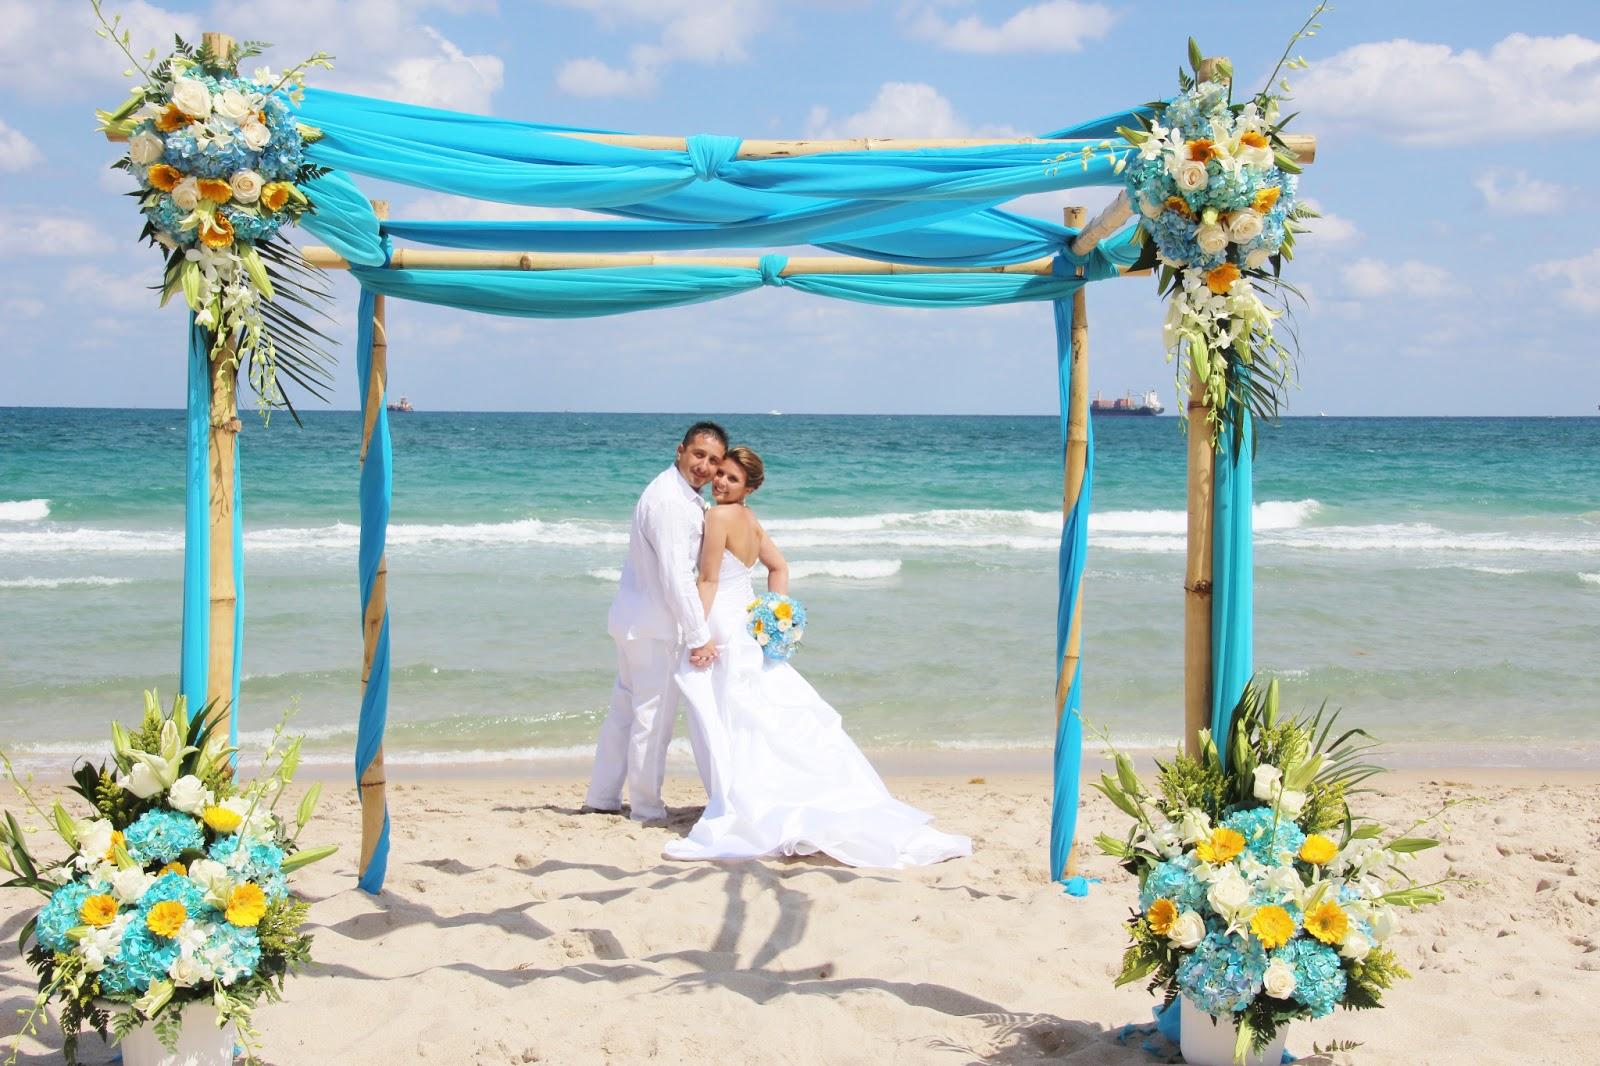 IMG 2352 - beach wedding fort lauderdale